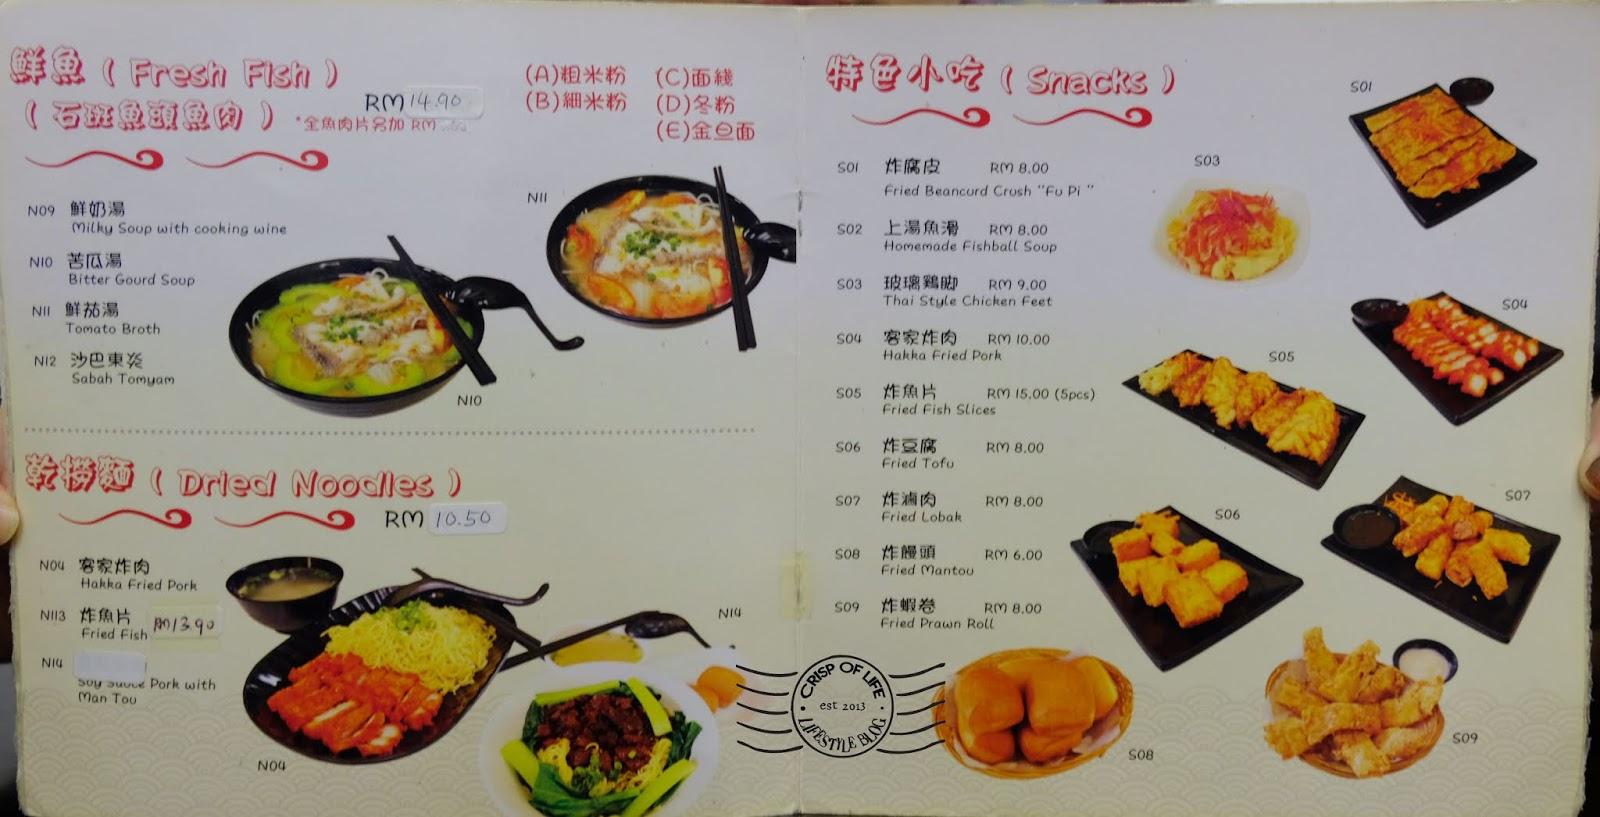 Habee's Kitchen 哈吡食馆海鮮粉 Jalan Bawasah